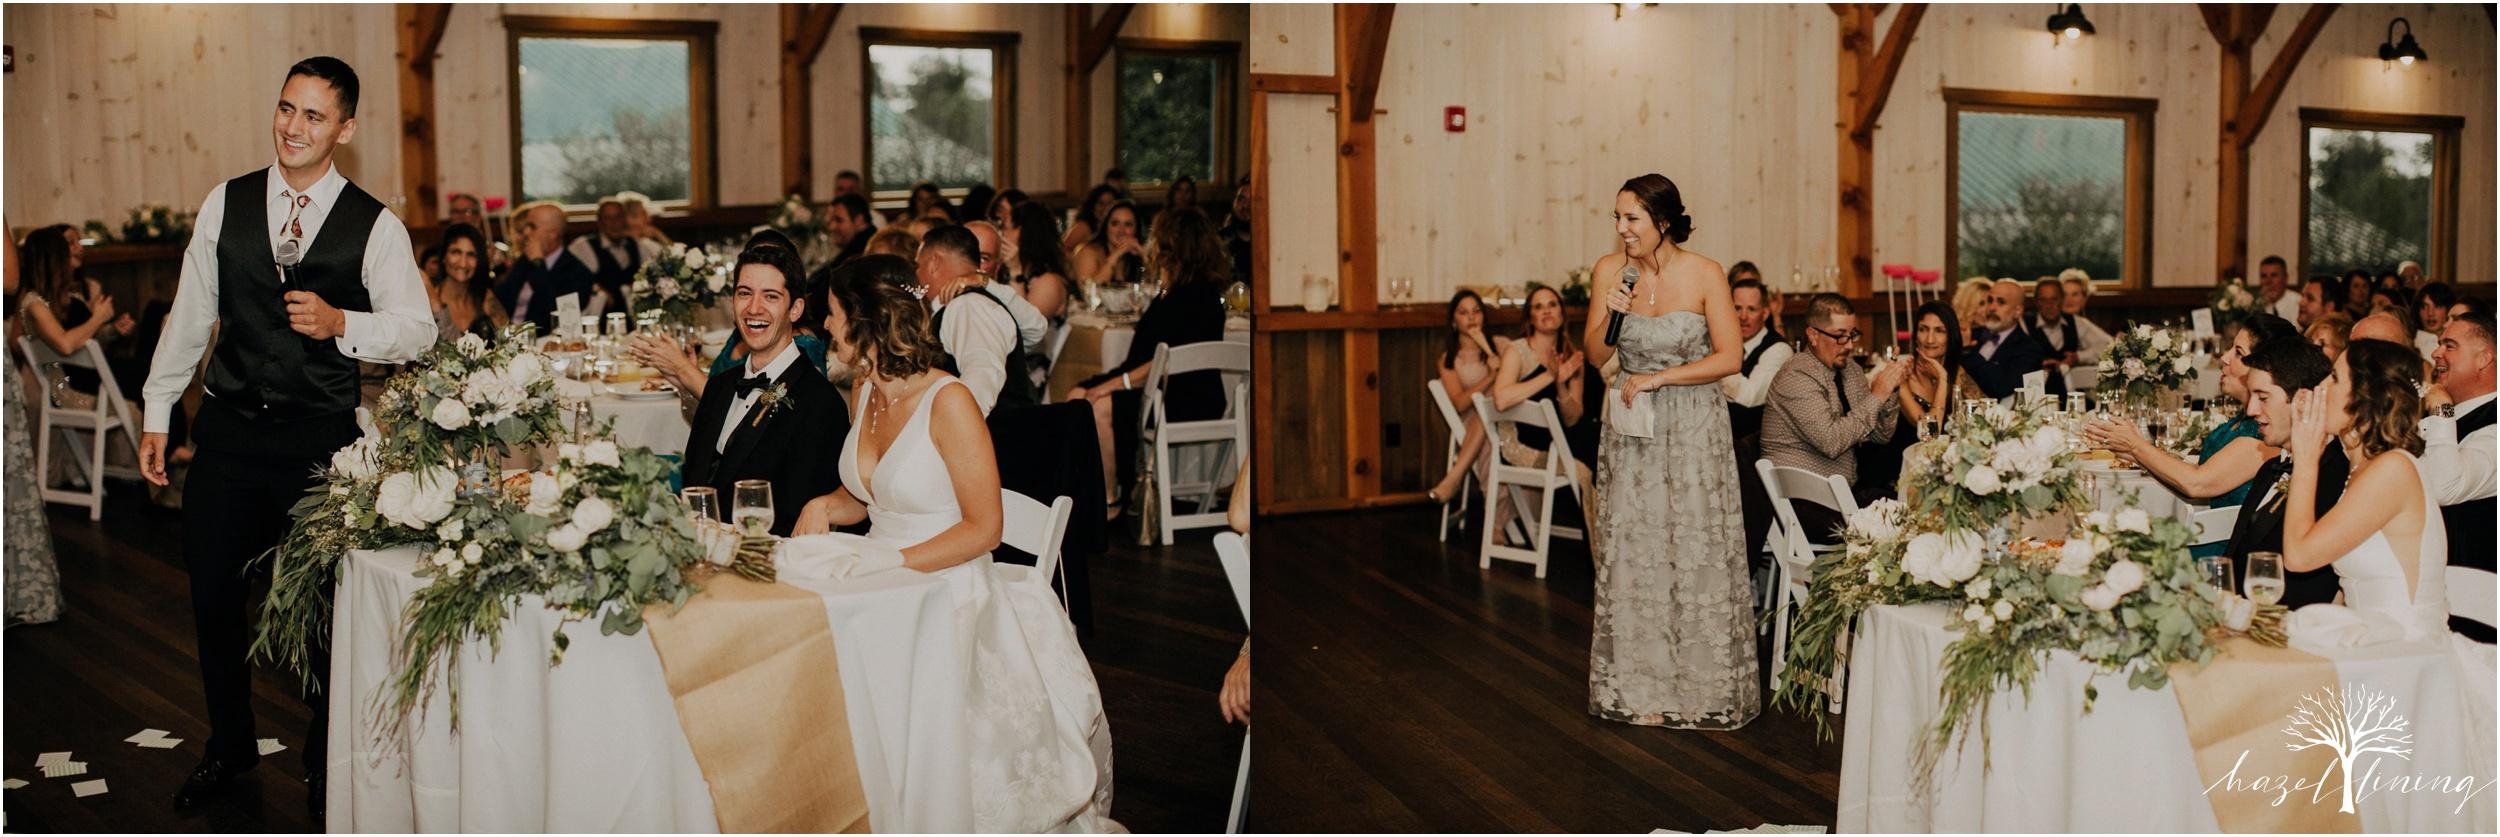 maureen-hepner-anthony-giordano-rose-bank-winery-newtow-pennsylvania-luxury-summer-wedding-hazel-lining-photography-destination-elopement-wedding-engagement-photography_0141.jpg